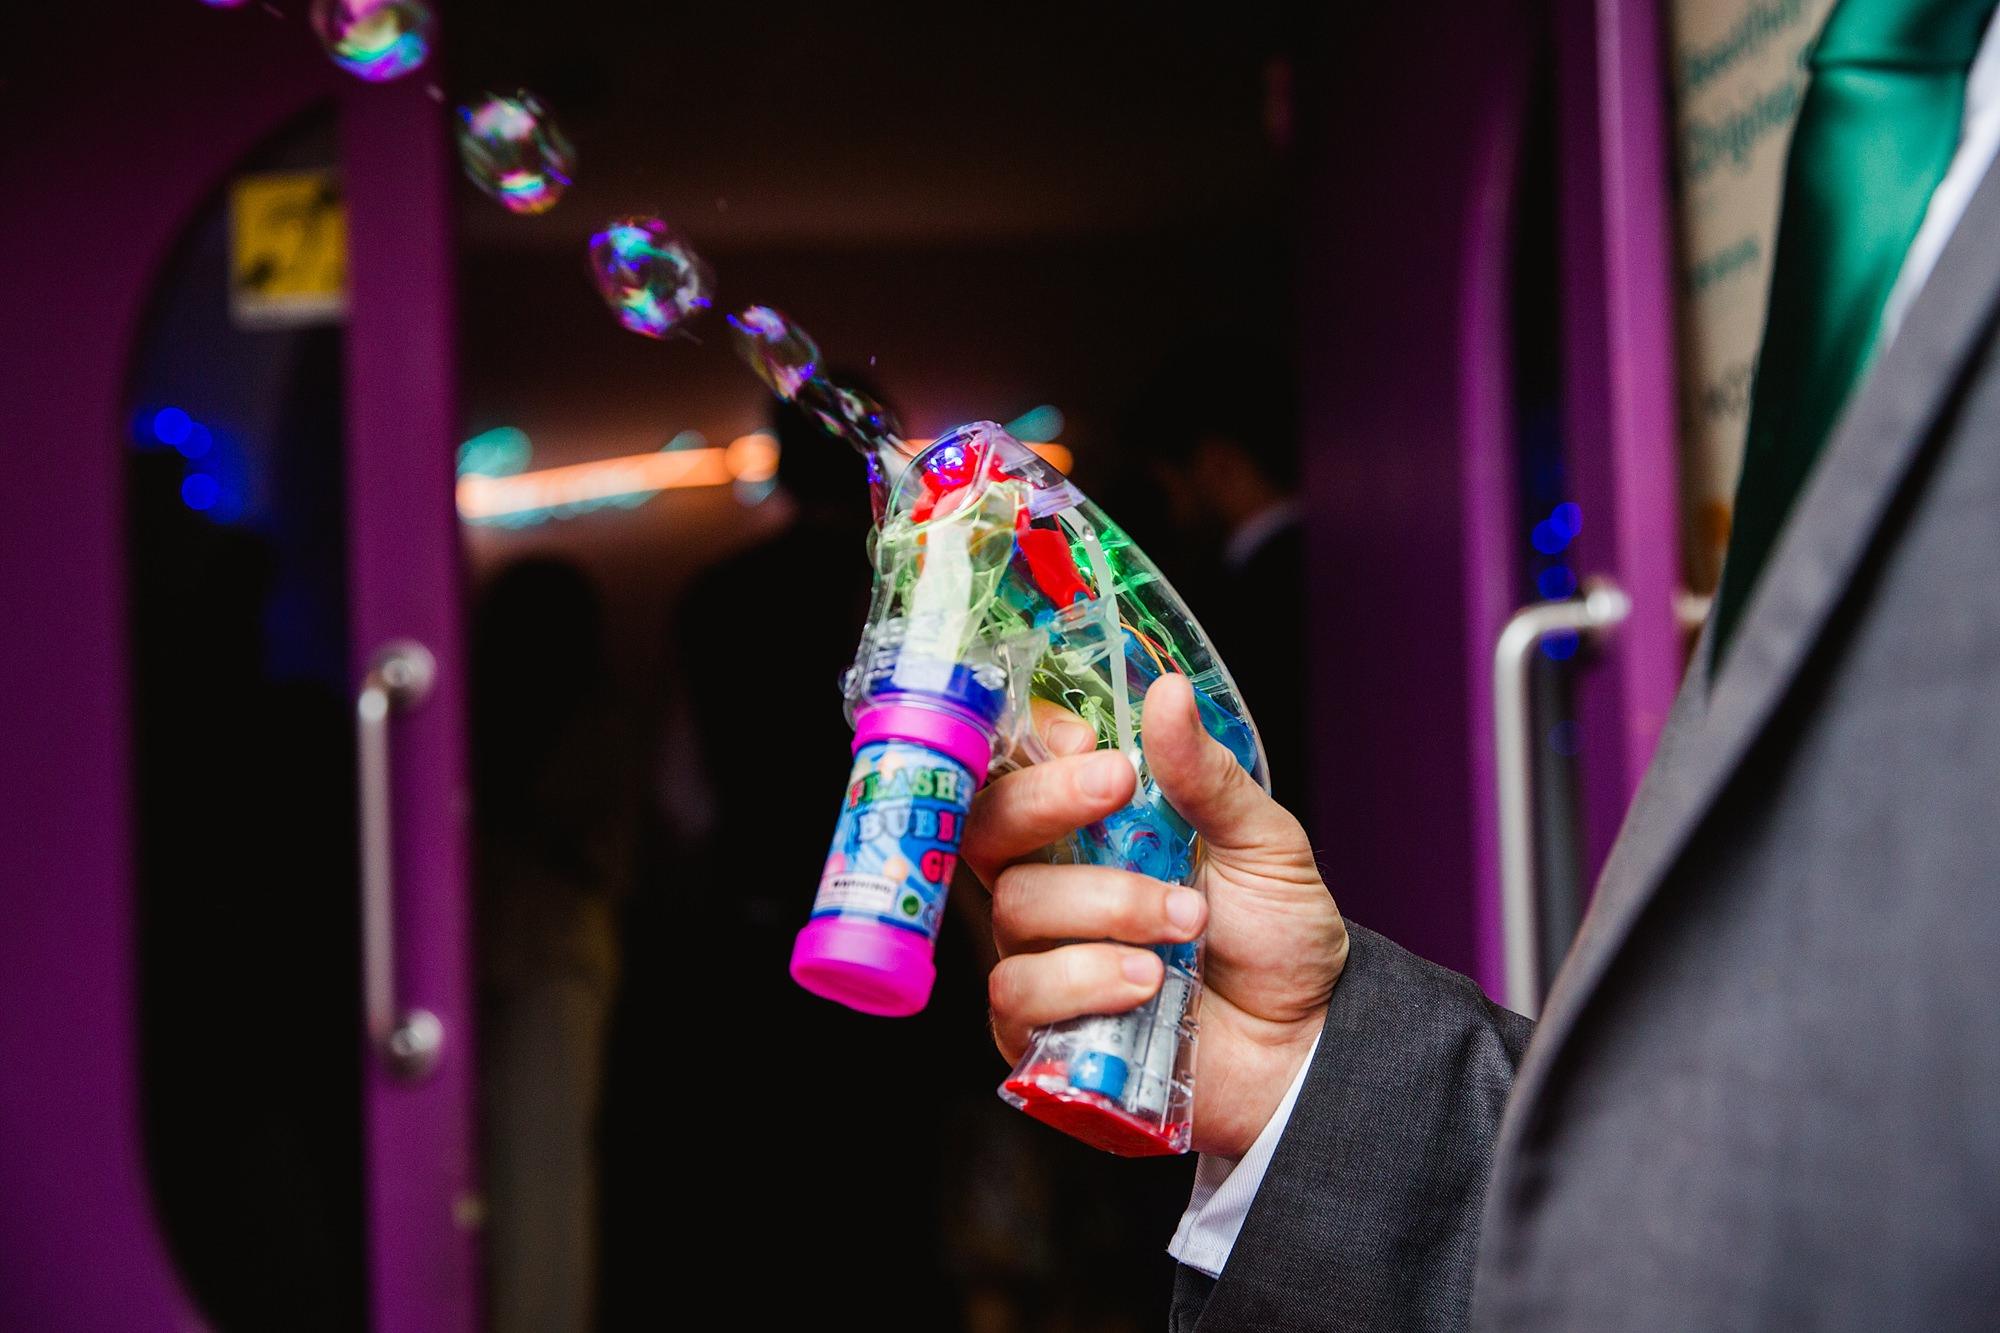 Paradise by way of Kensal Green wedding bubble gun